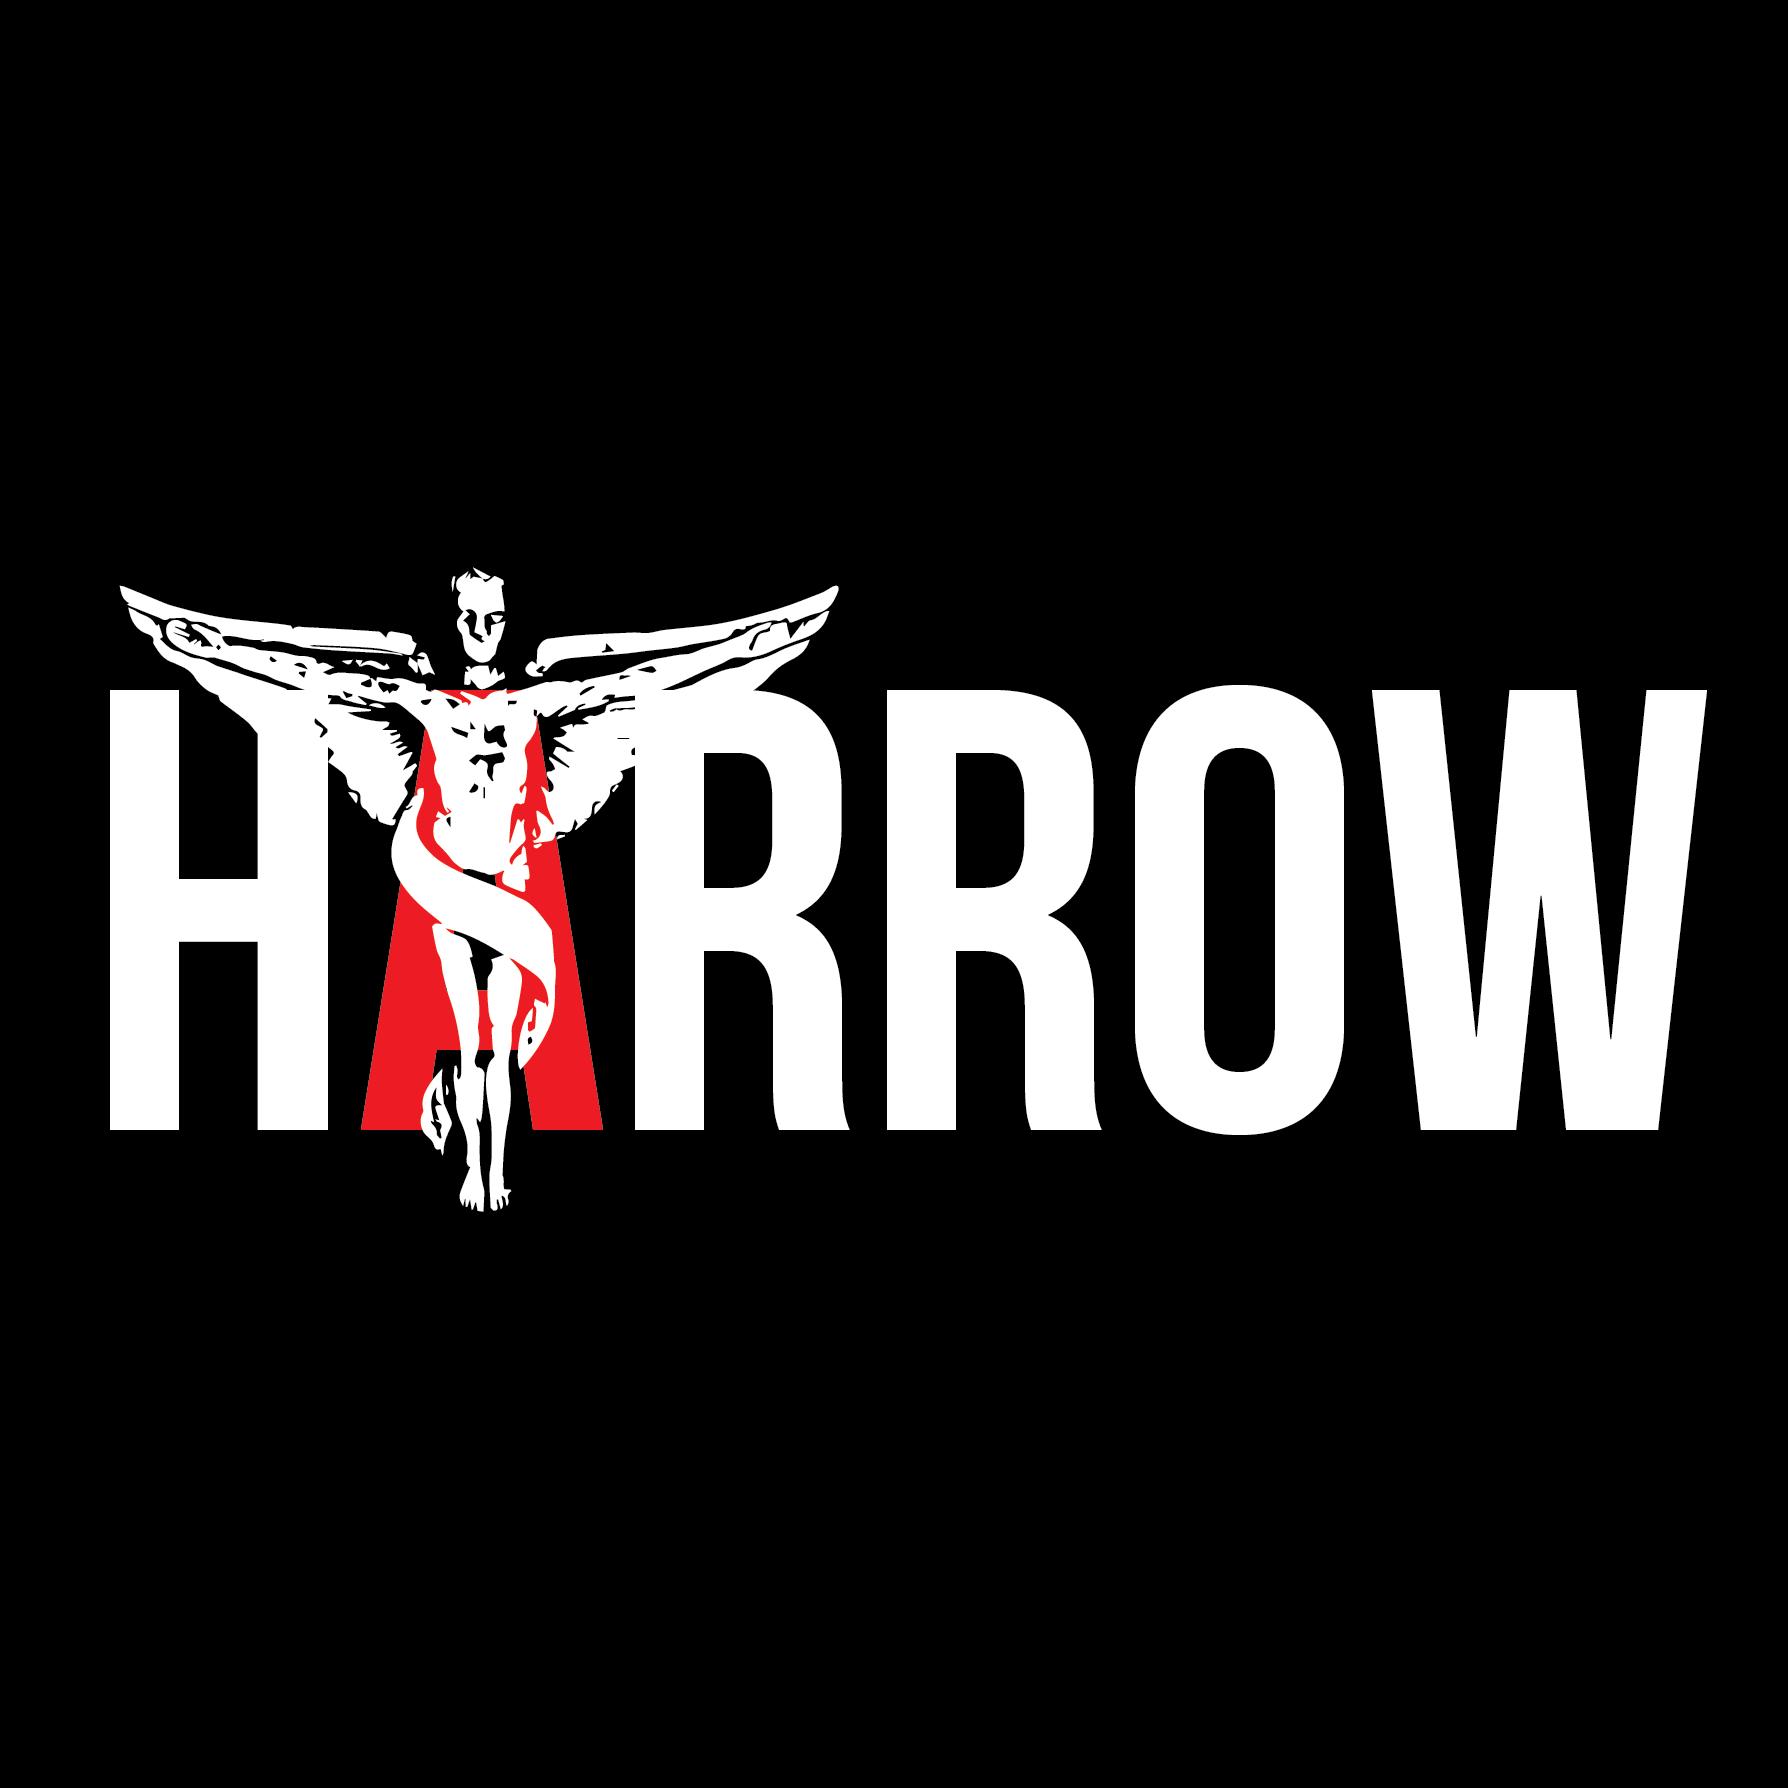 HARROW_LOGO_WHTonBLK_SQ